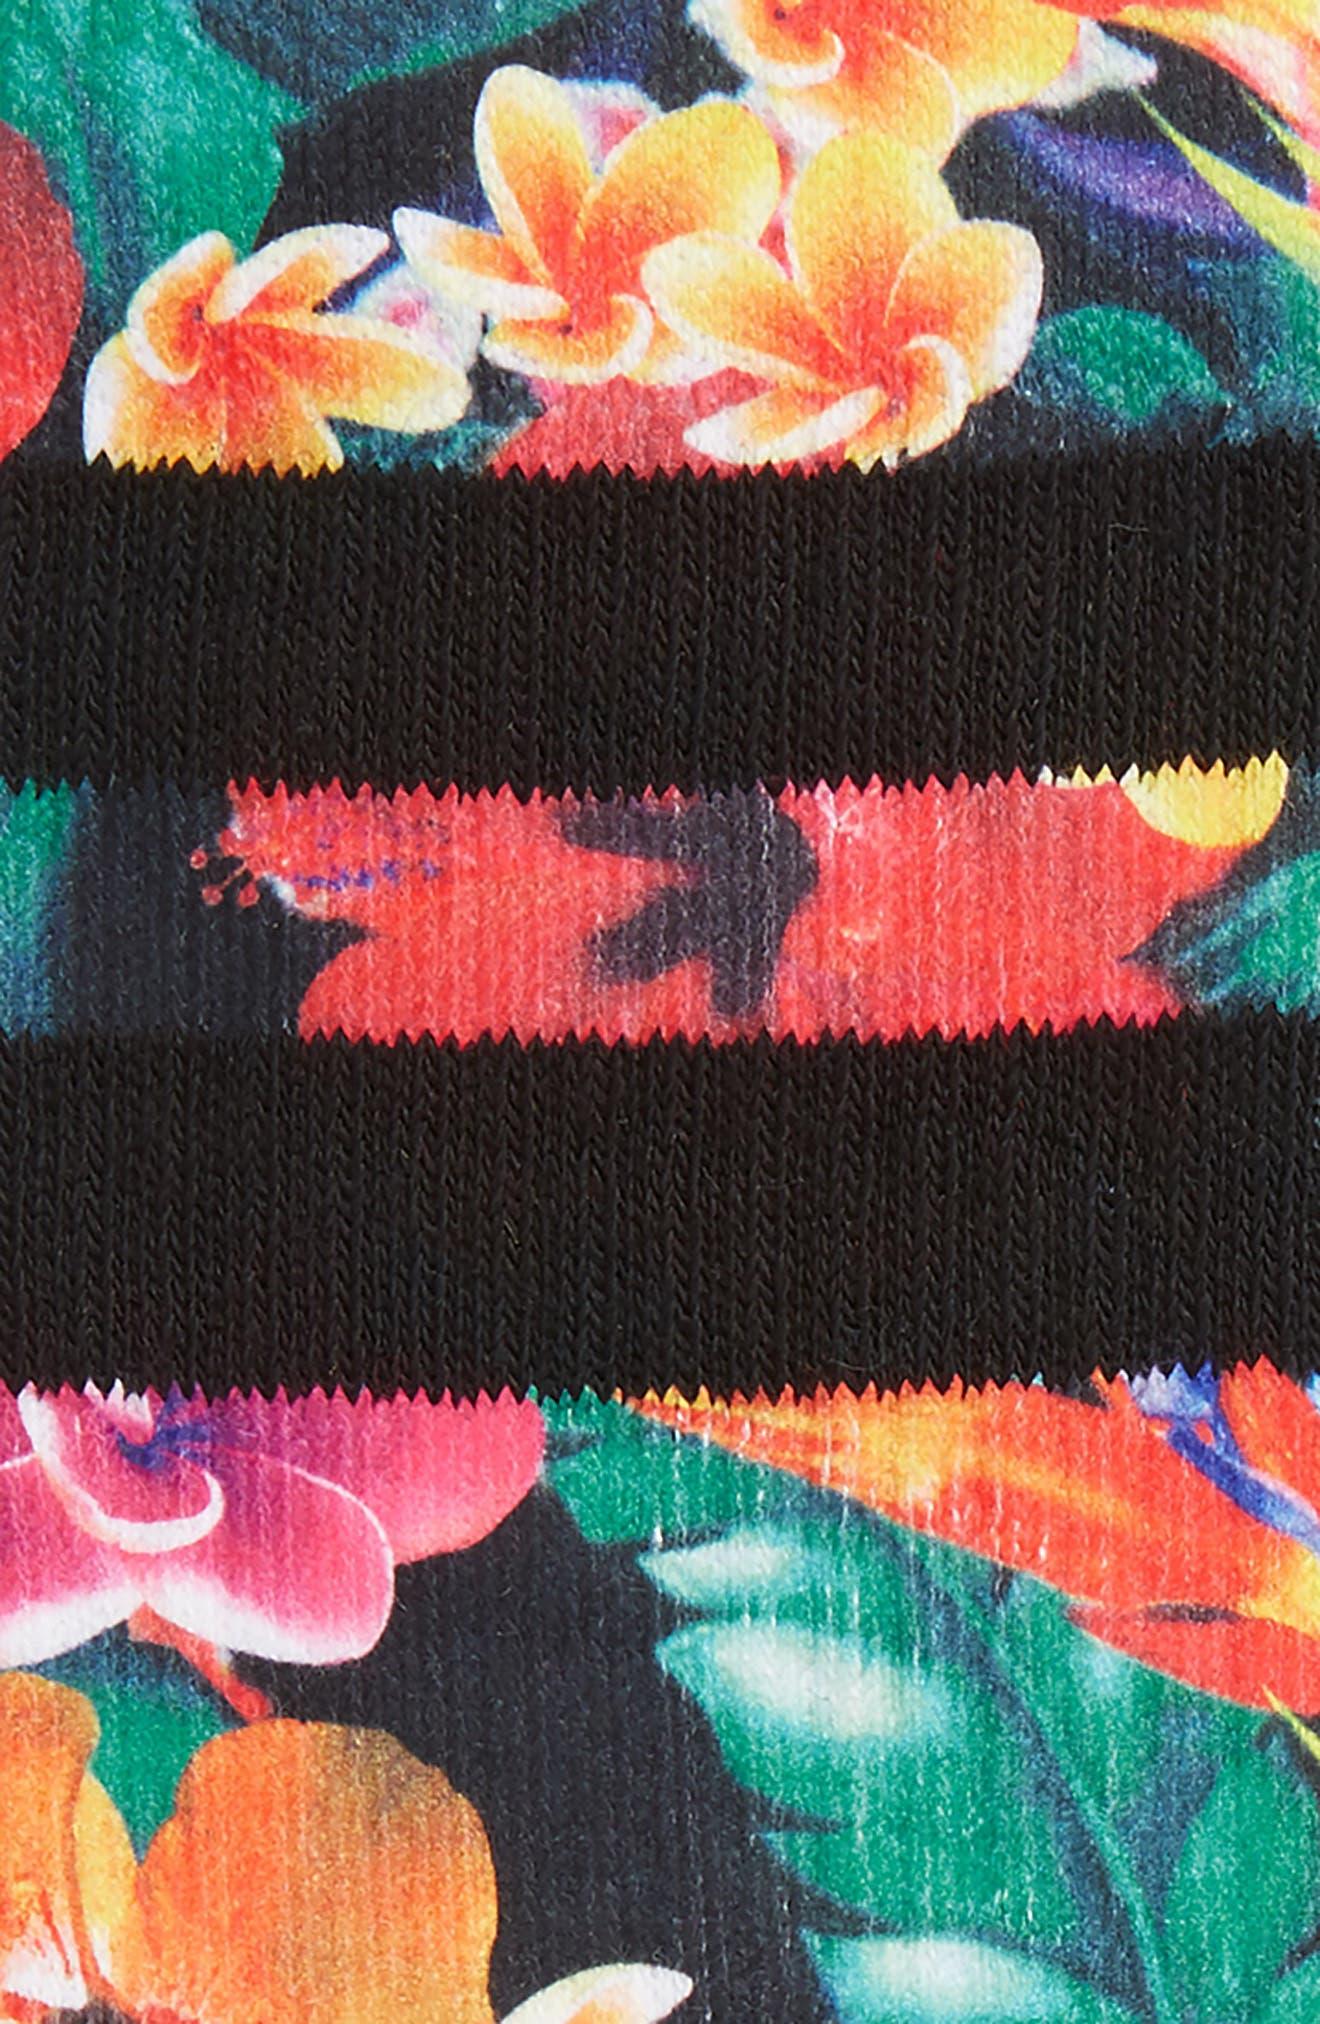 Pau Floral Socks,                             Alternate thumbnail 2, color,                             300